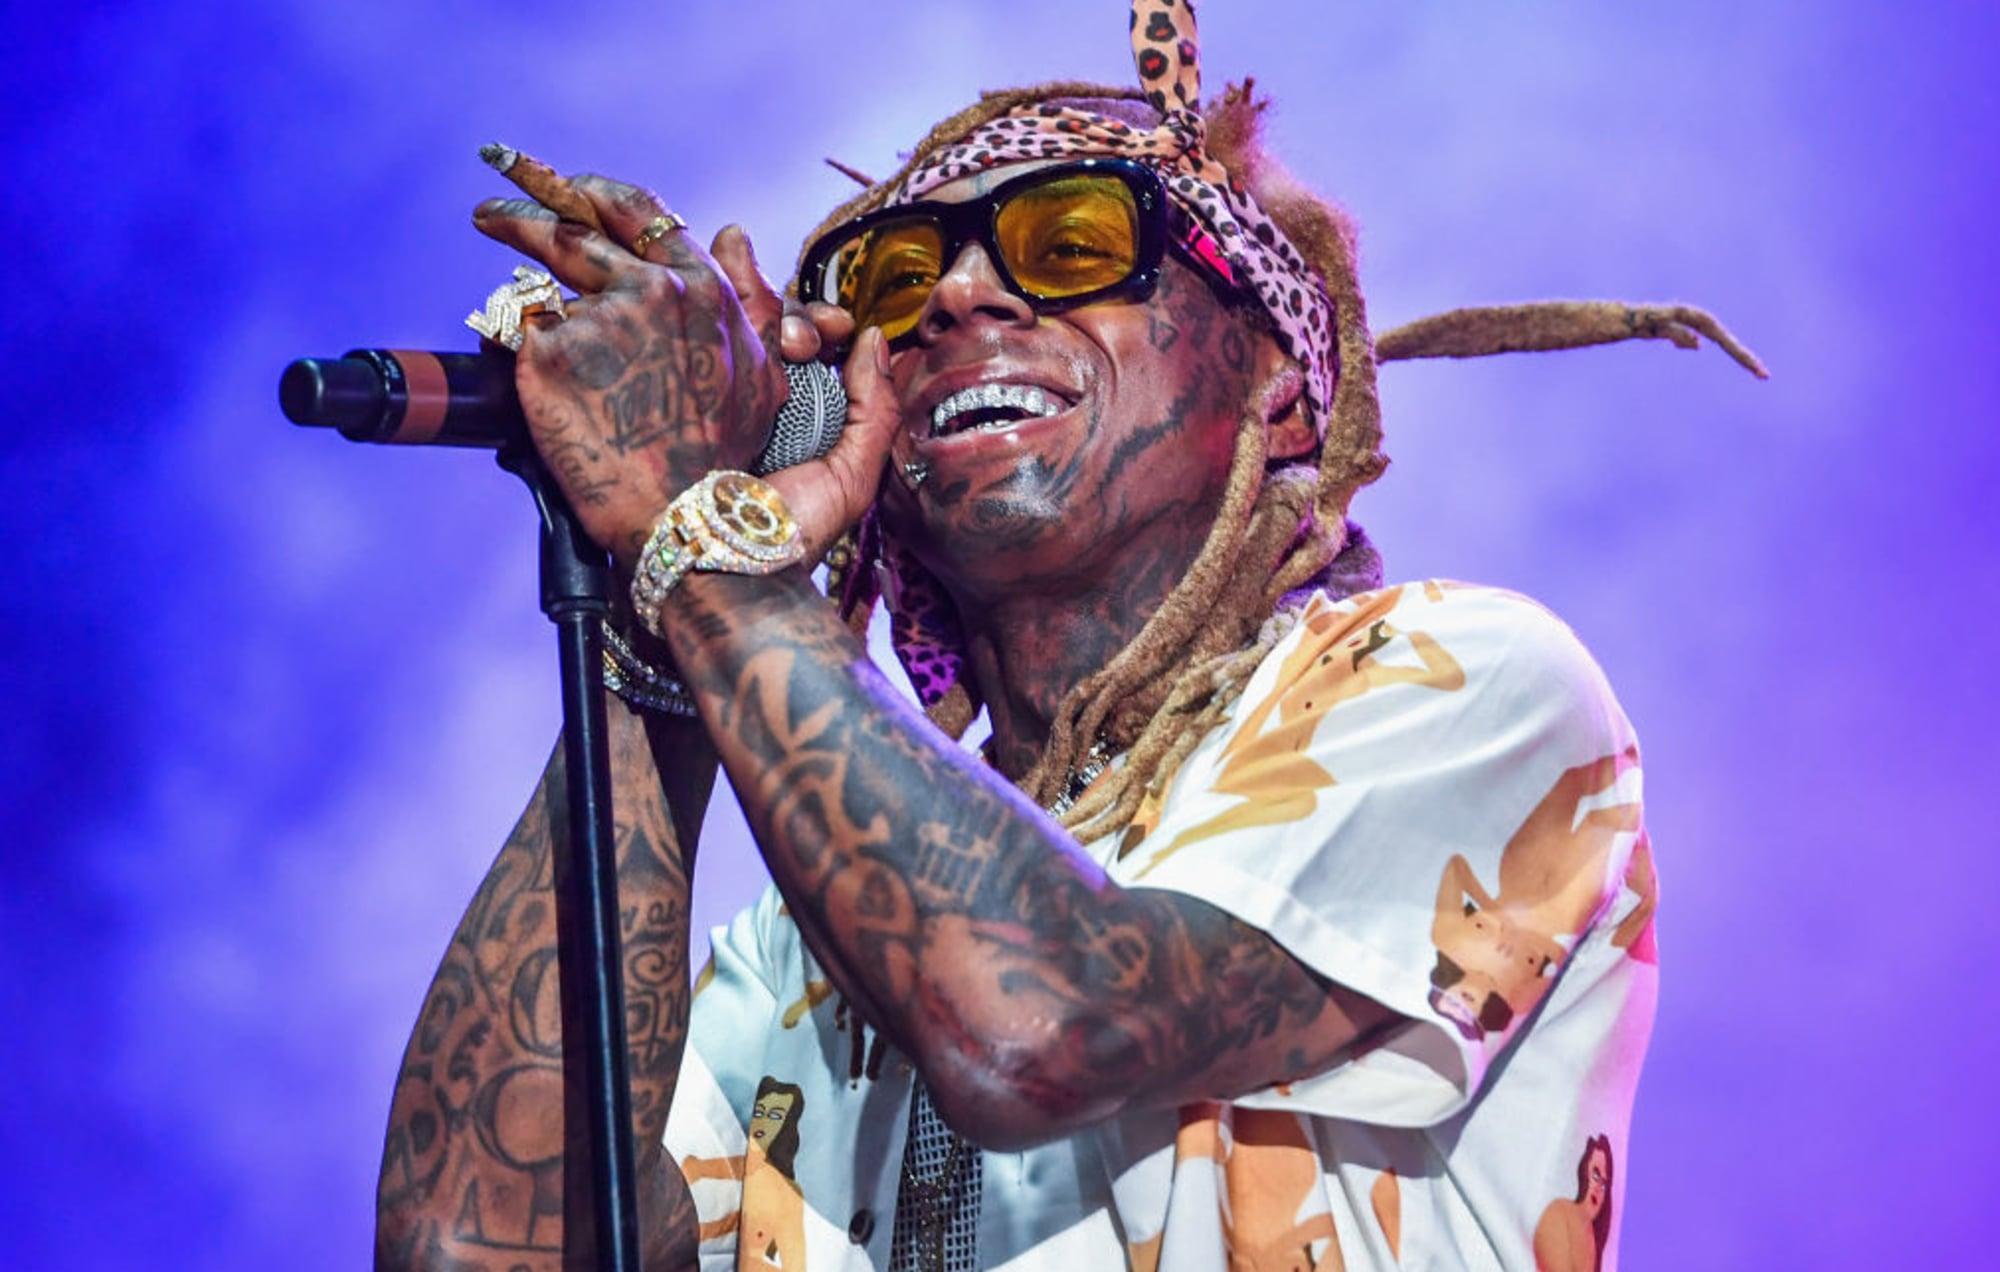 Lil Wayne at Drai's Nightclub